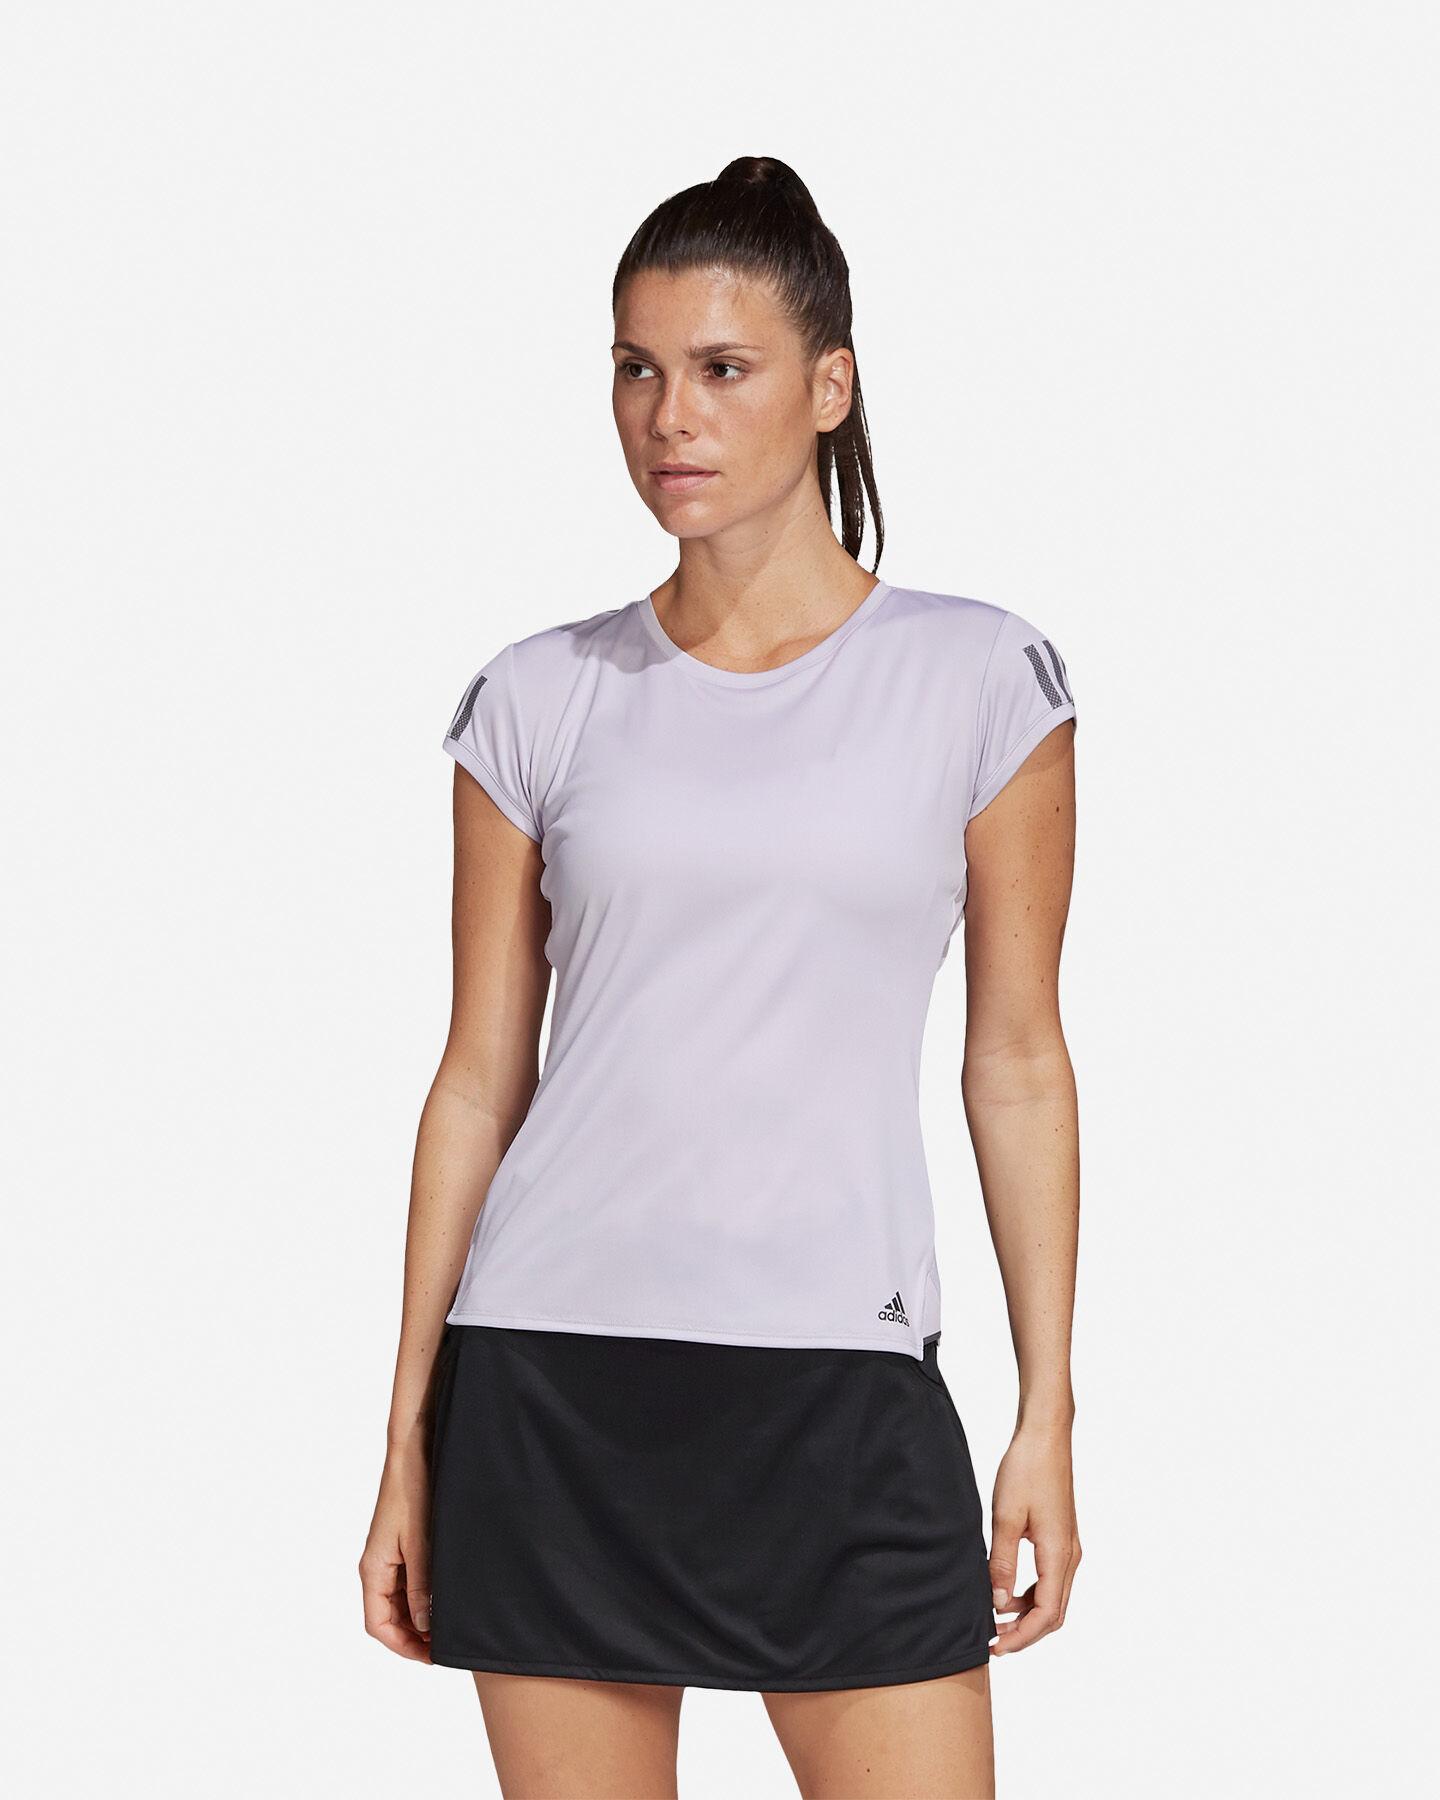 T-Shirt tennis ADIDAS 3-STRIPES CLUB W S5155173 scatto 2